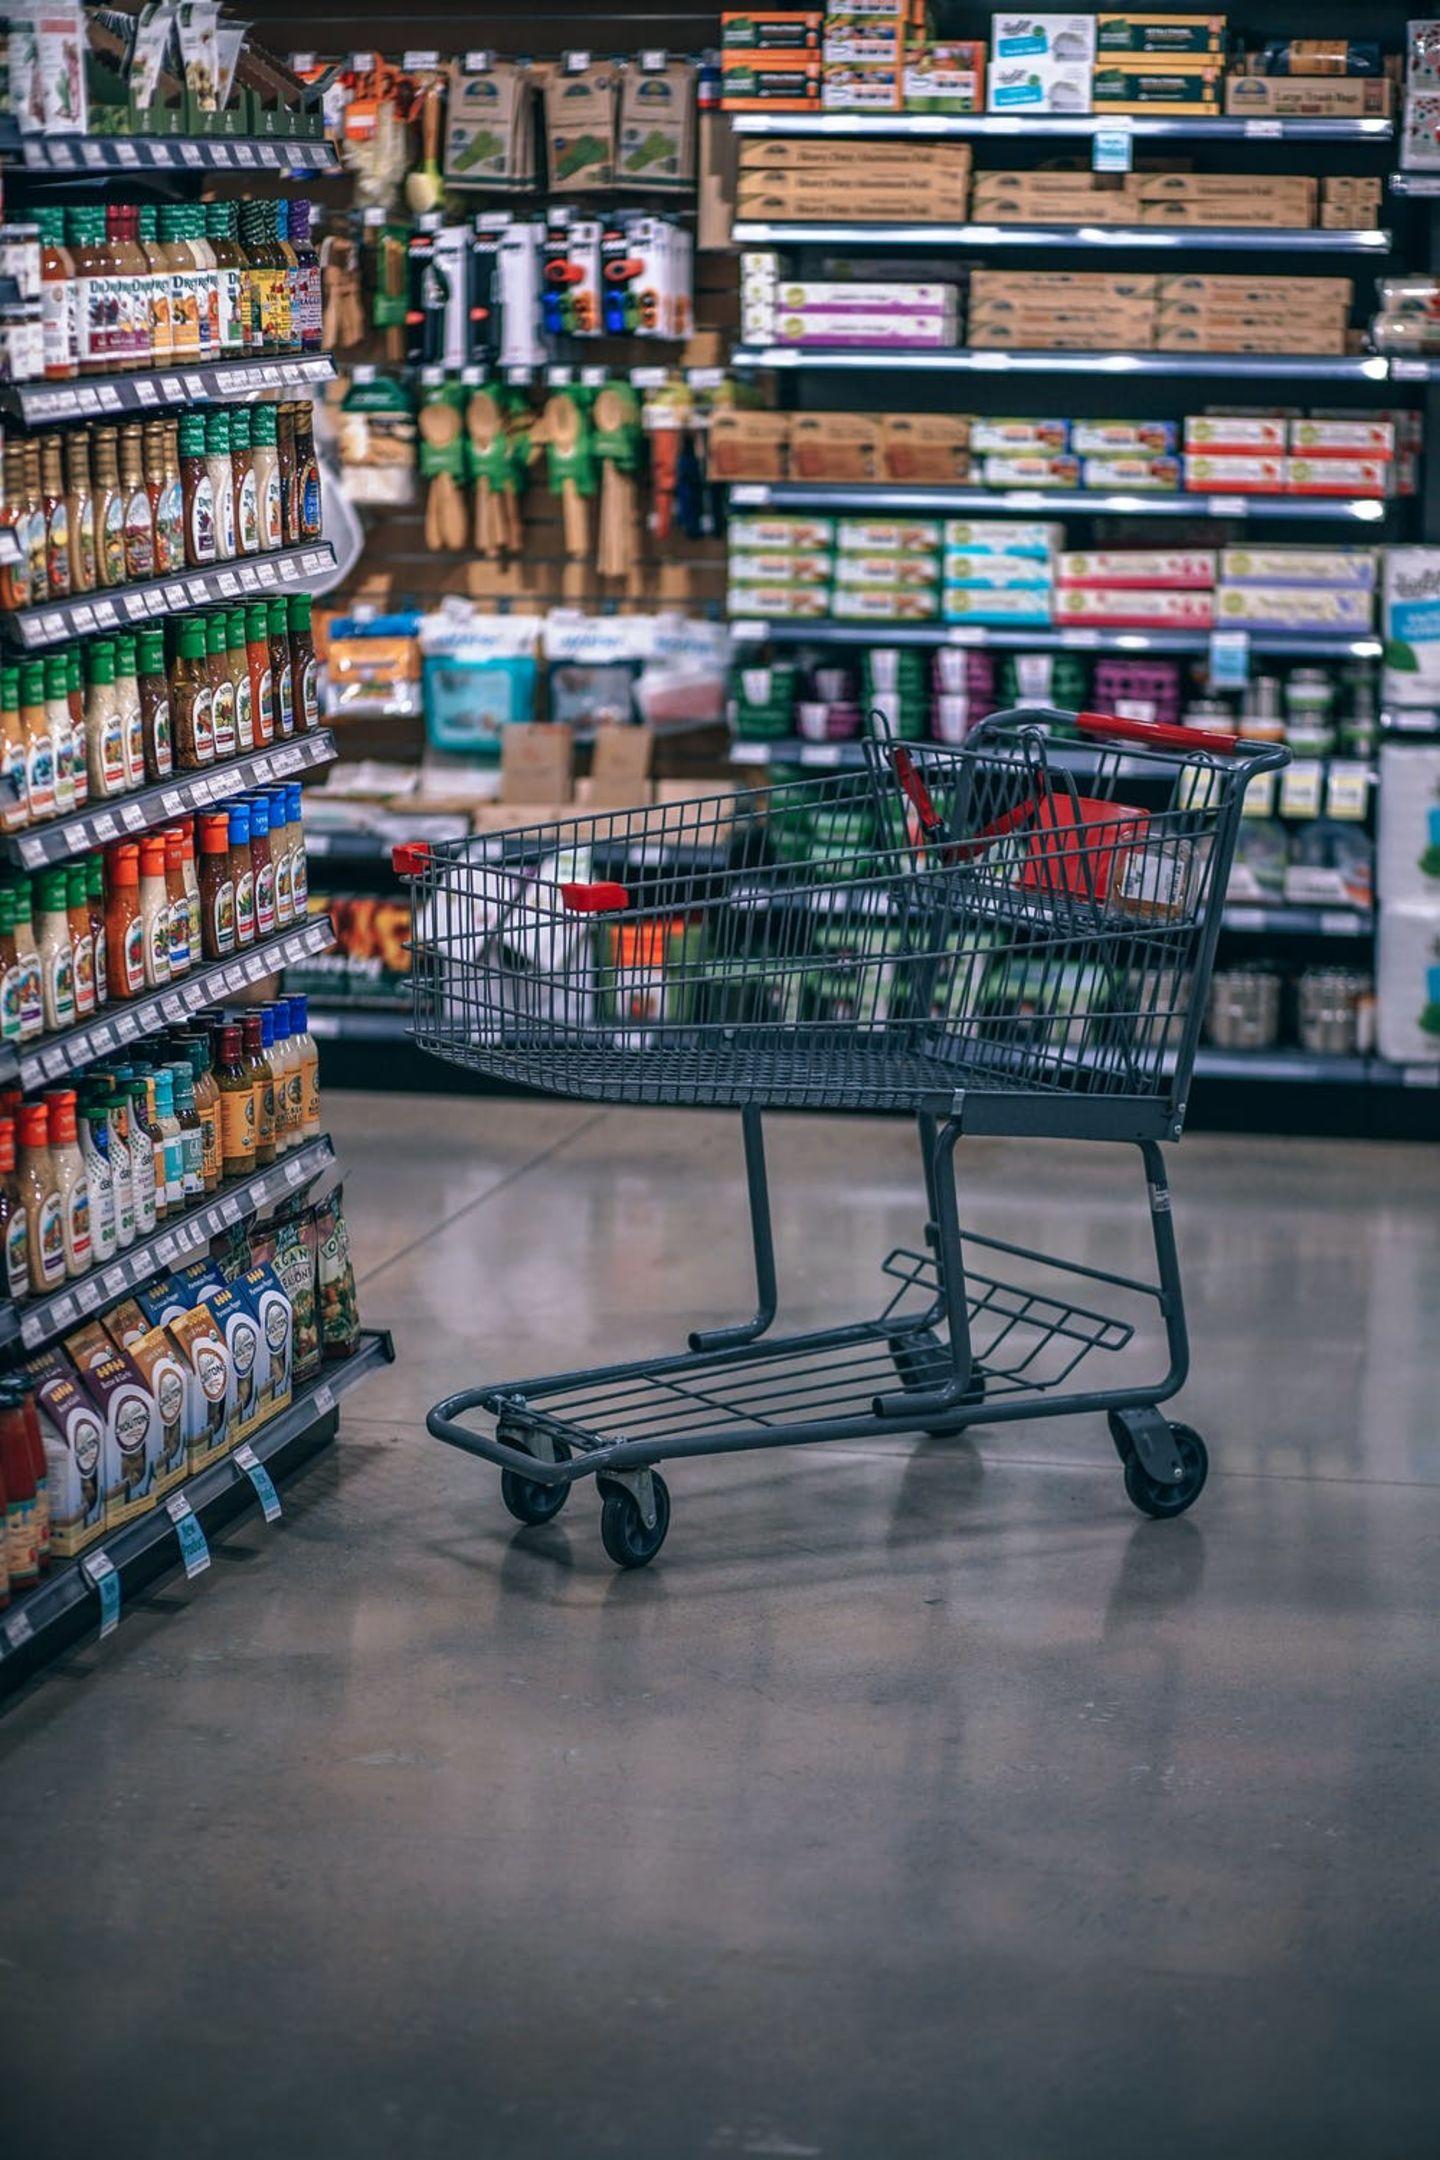 HiDubai-business-popular-grocery-shopping-supermarkets-hypermarkets-grocery-stores-al-karama-dubai